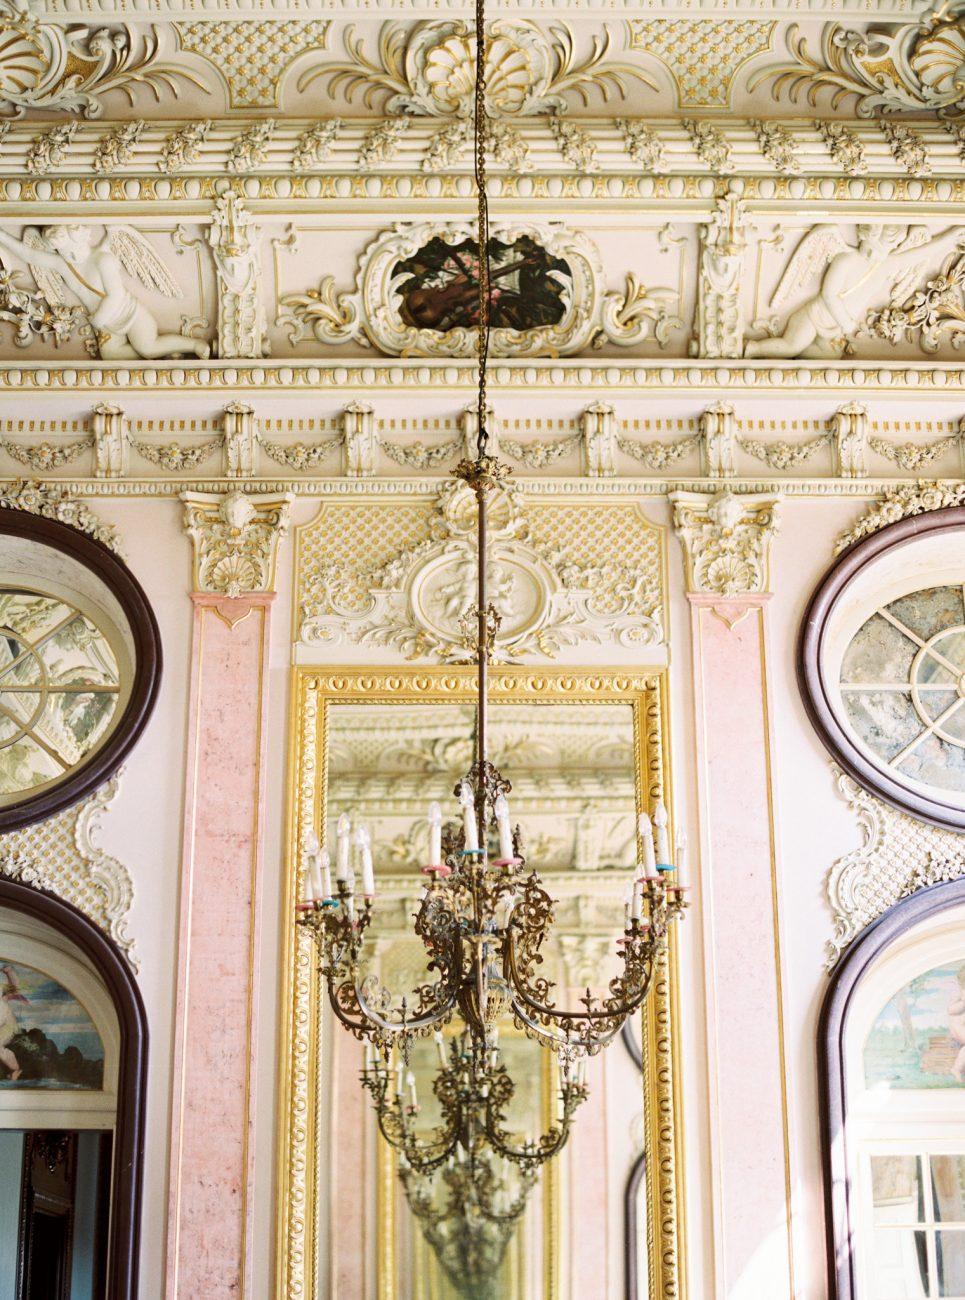 Portuguese Palace interiors